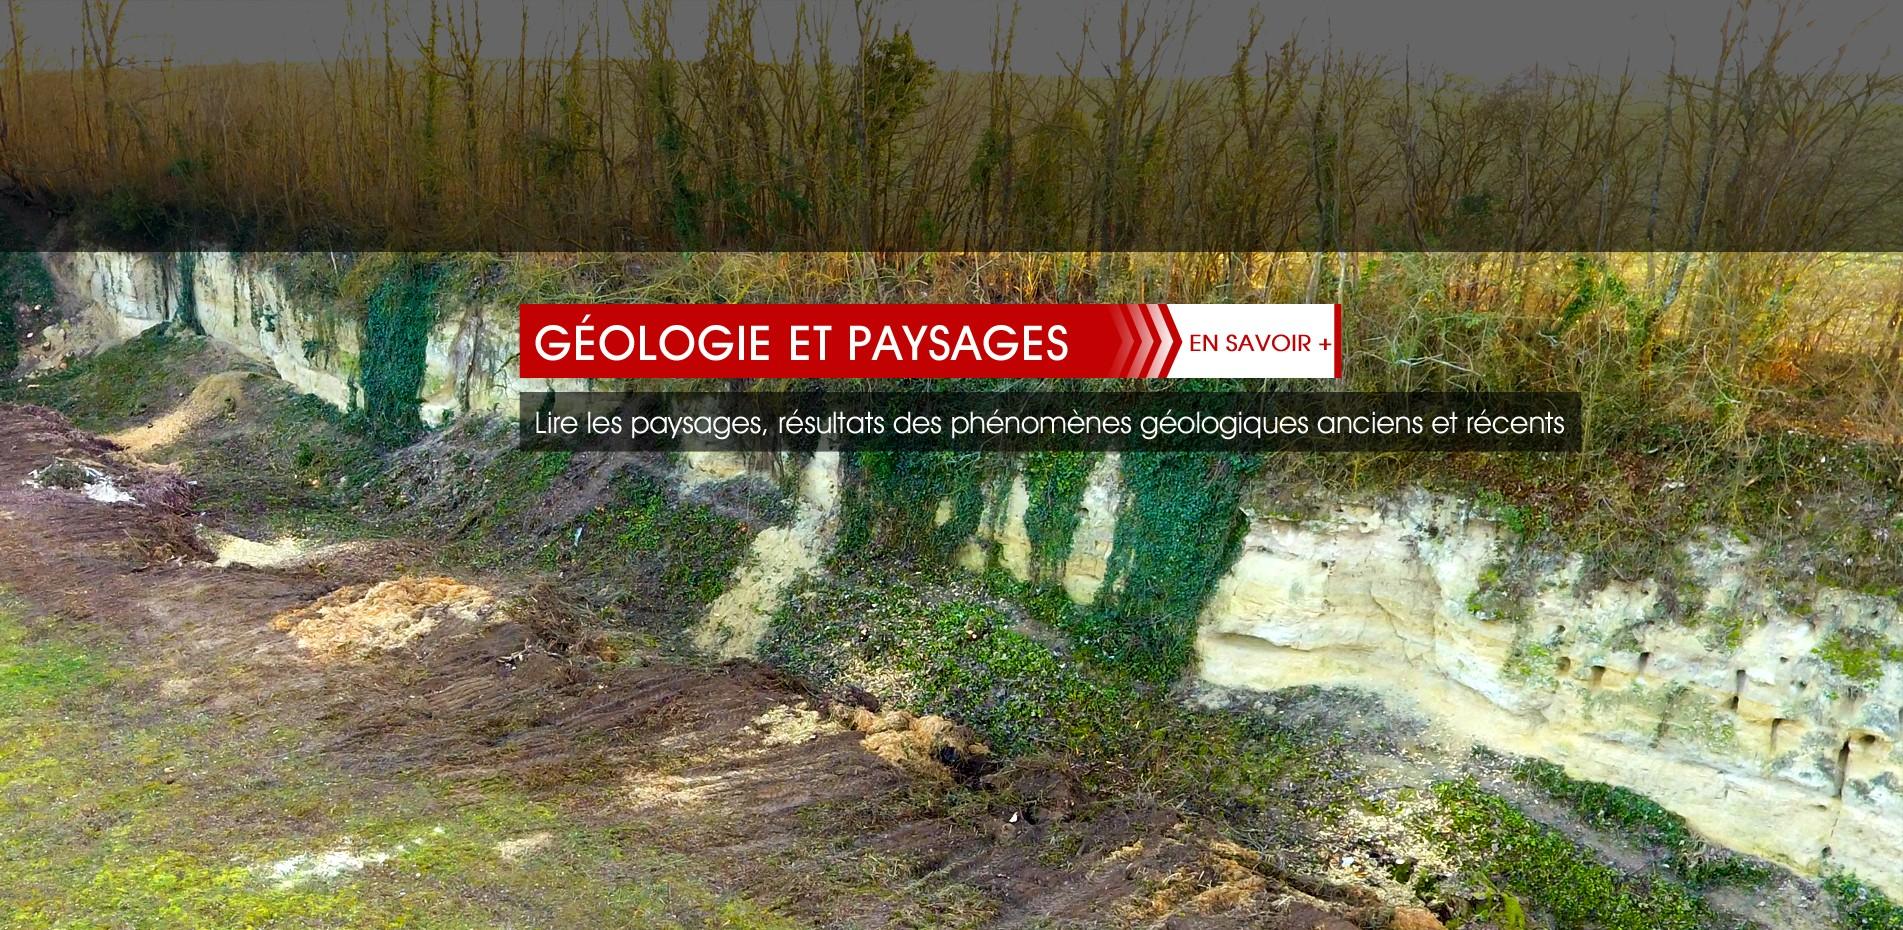 geologie-et-paysages